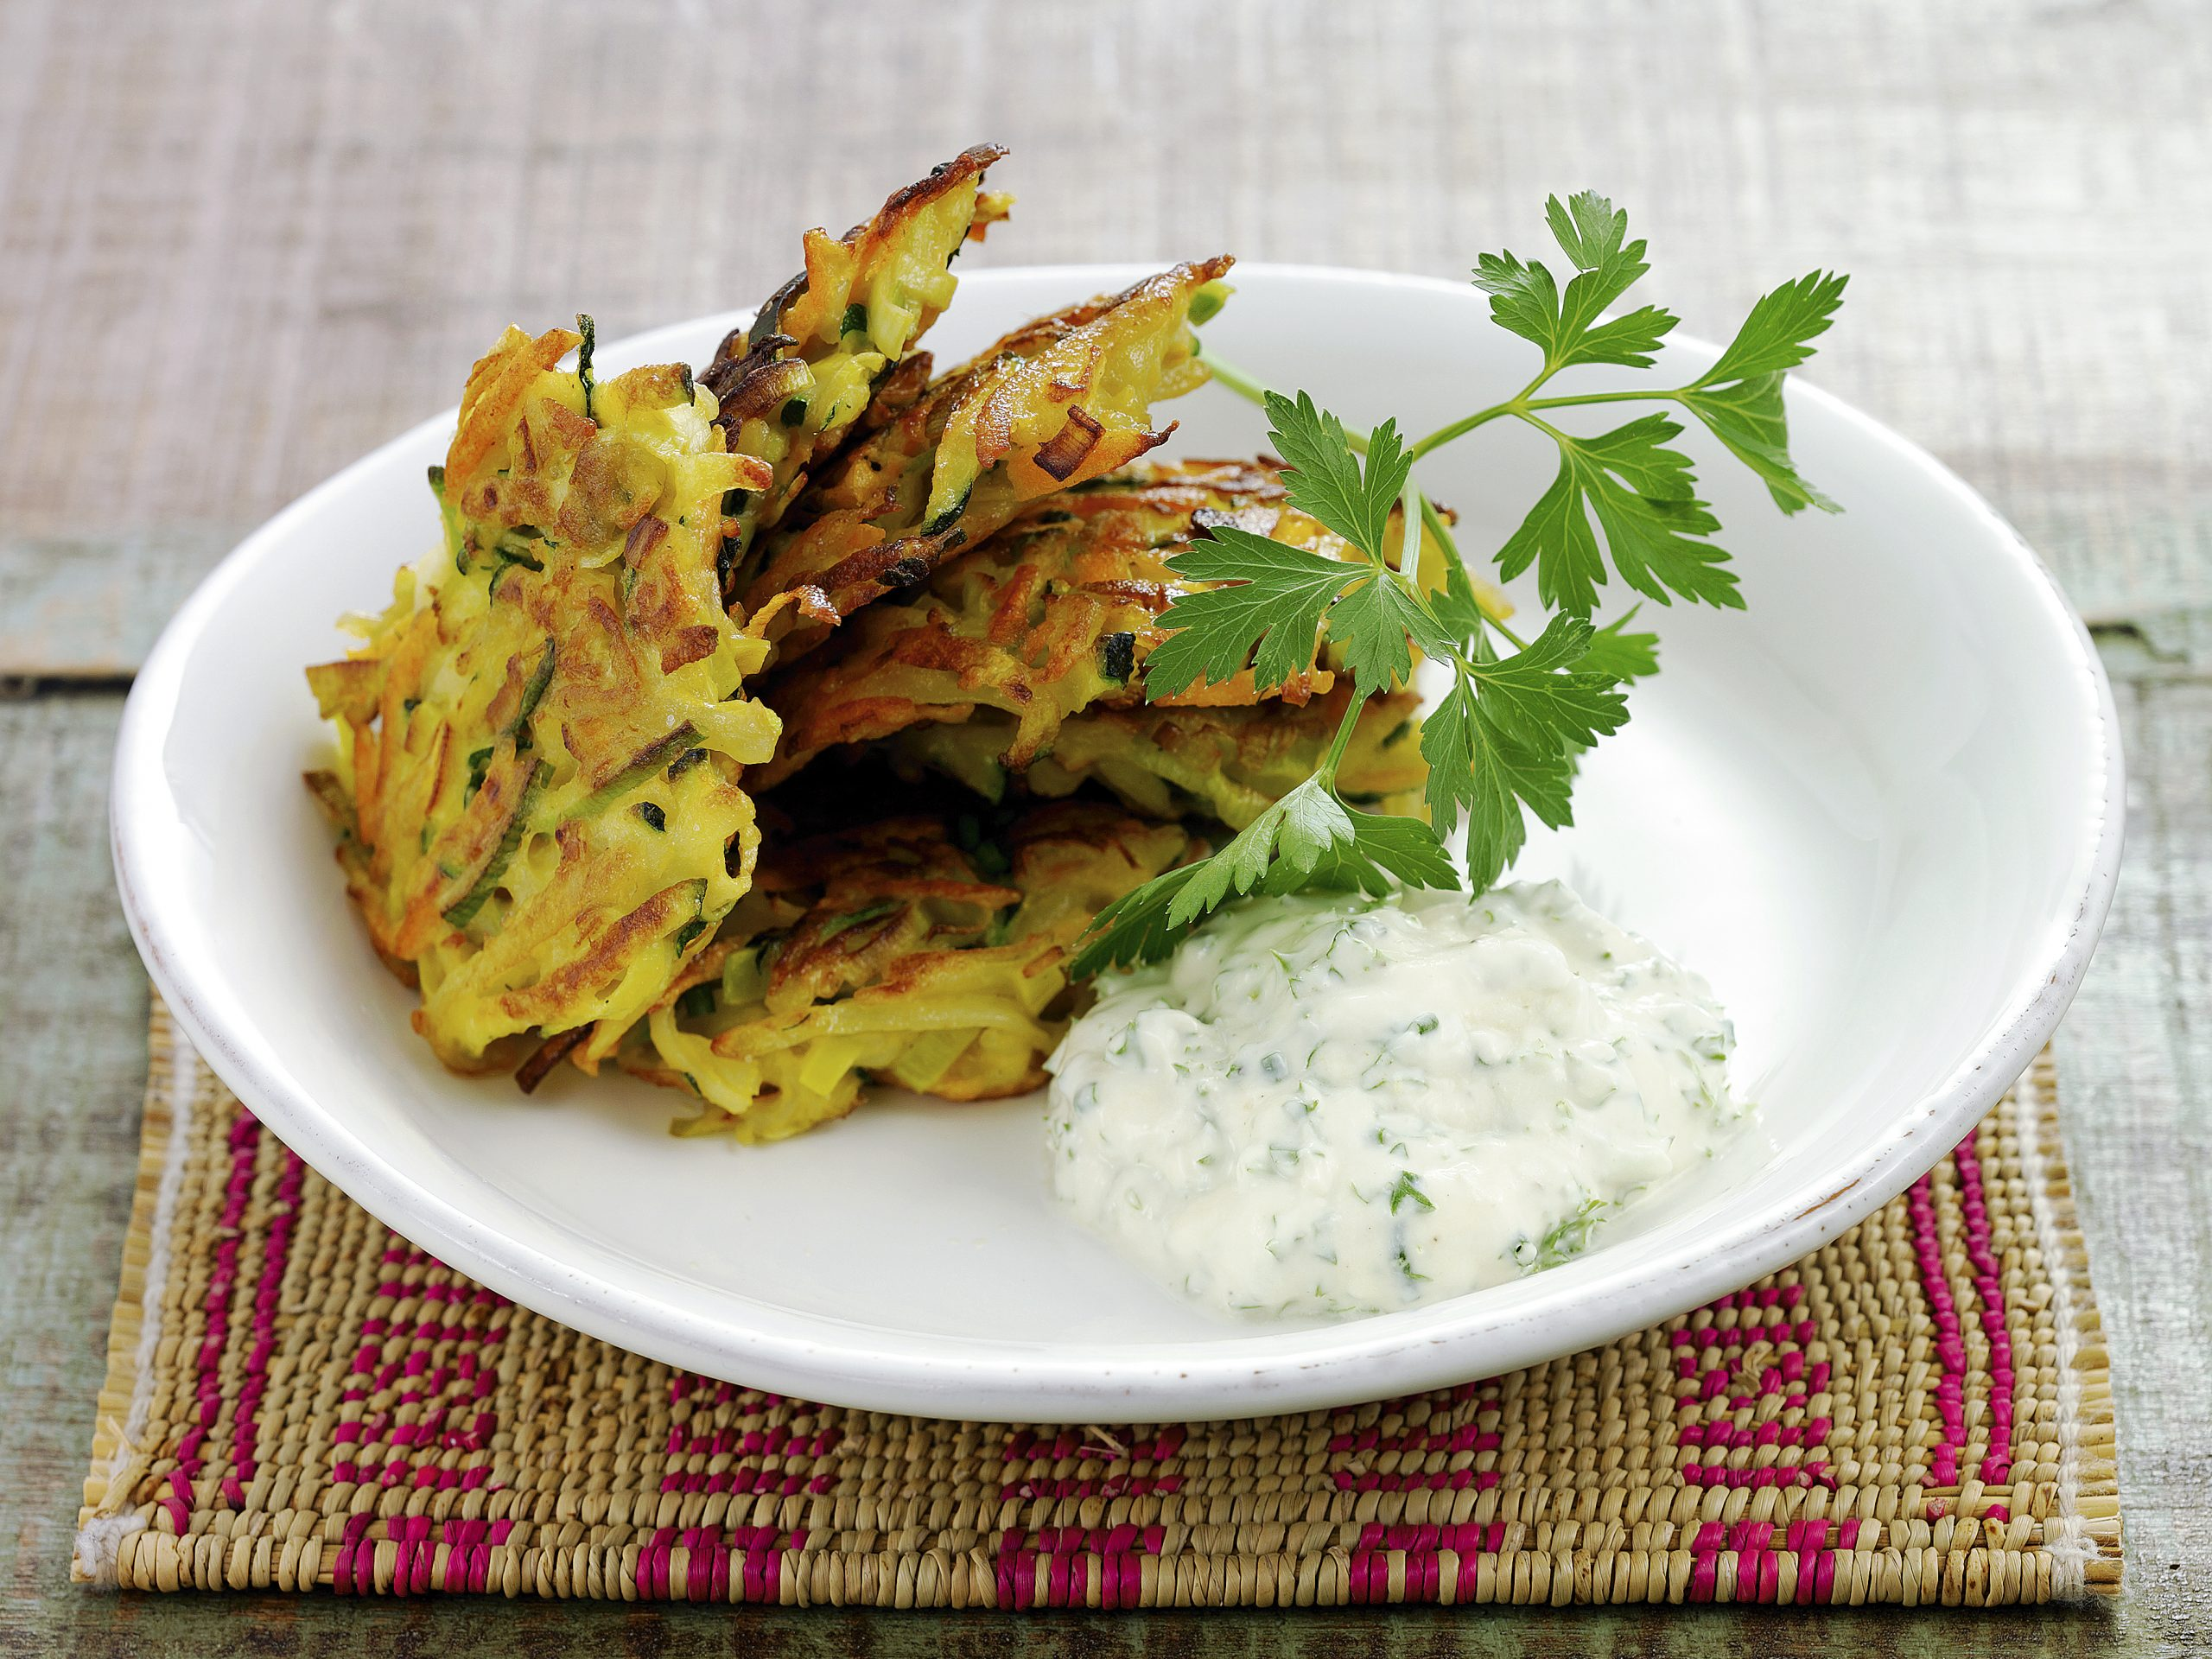 Kartoffel-Gemüse-Tätschli